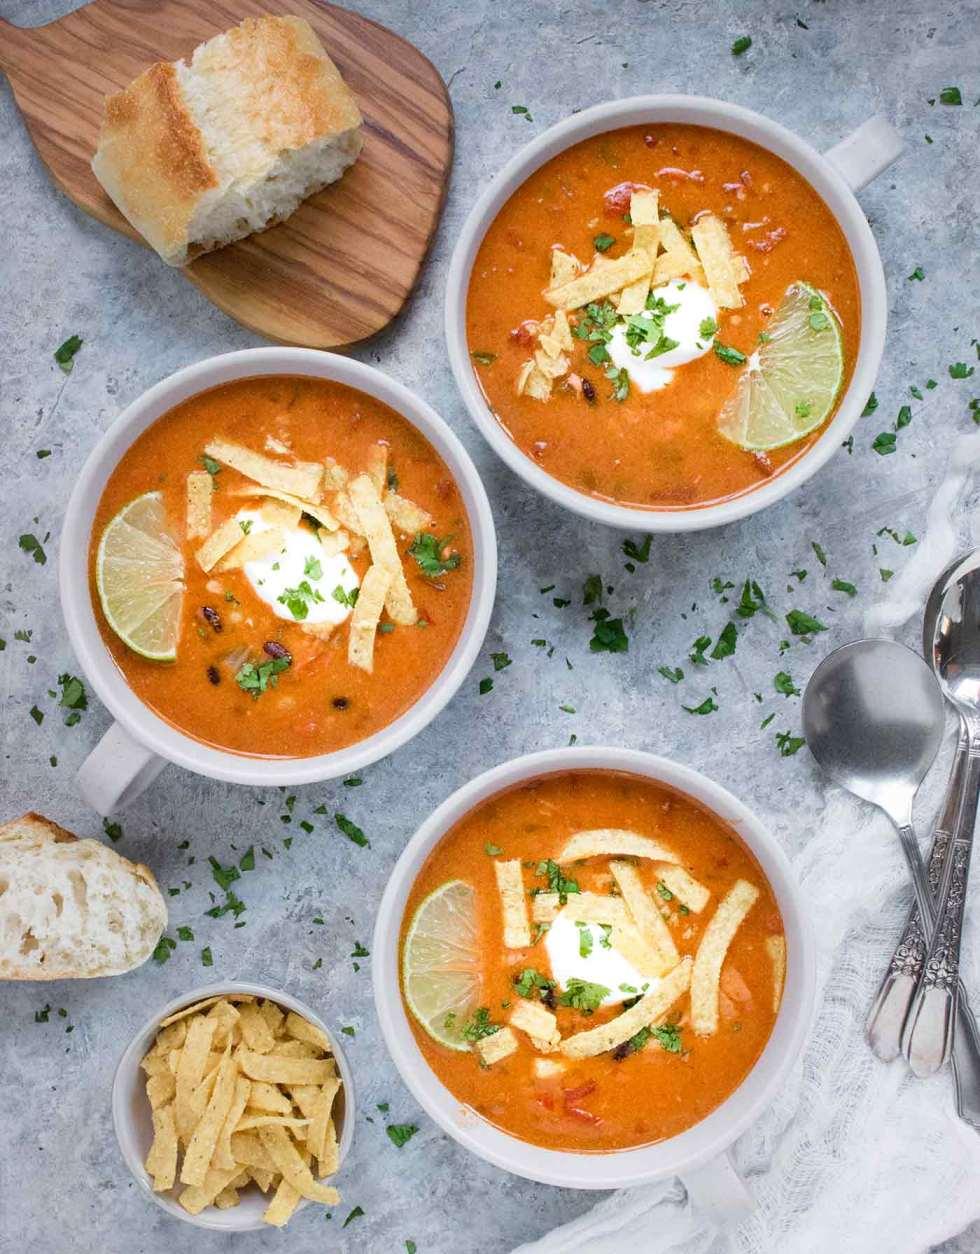 Three bowls of Instant Pot Chicken Tortilla Soup